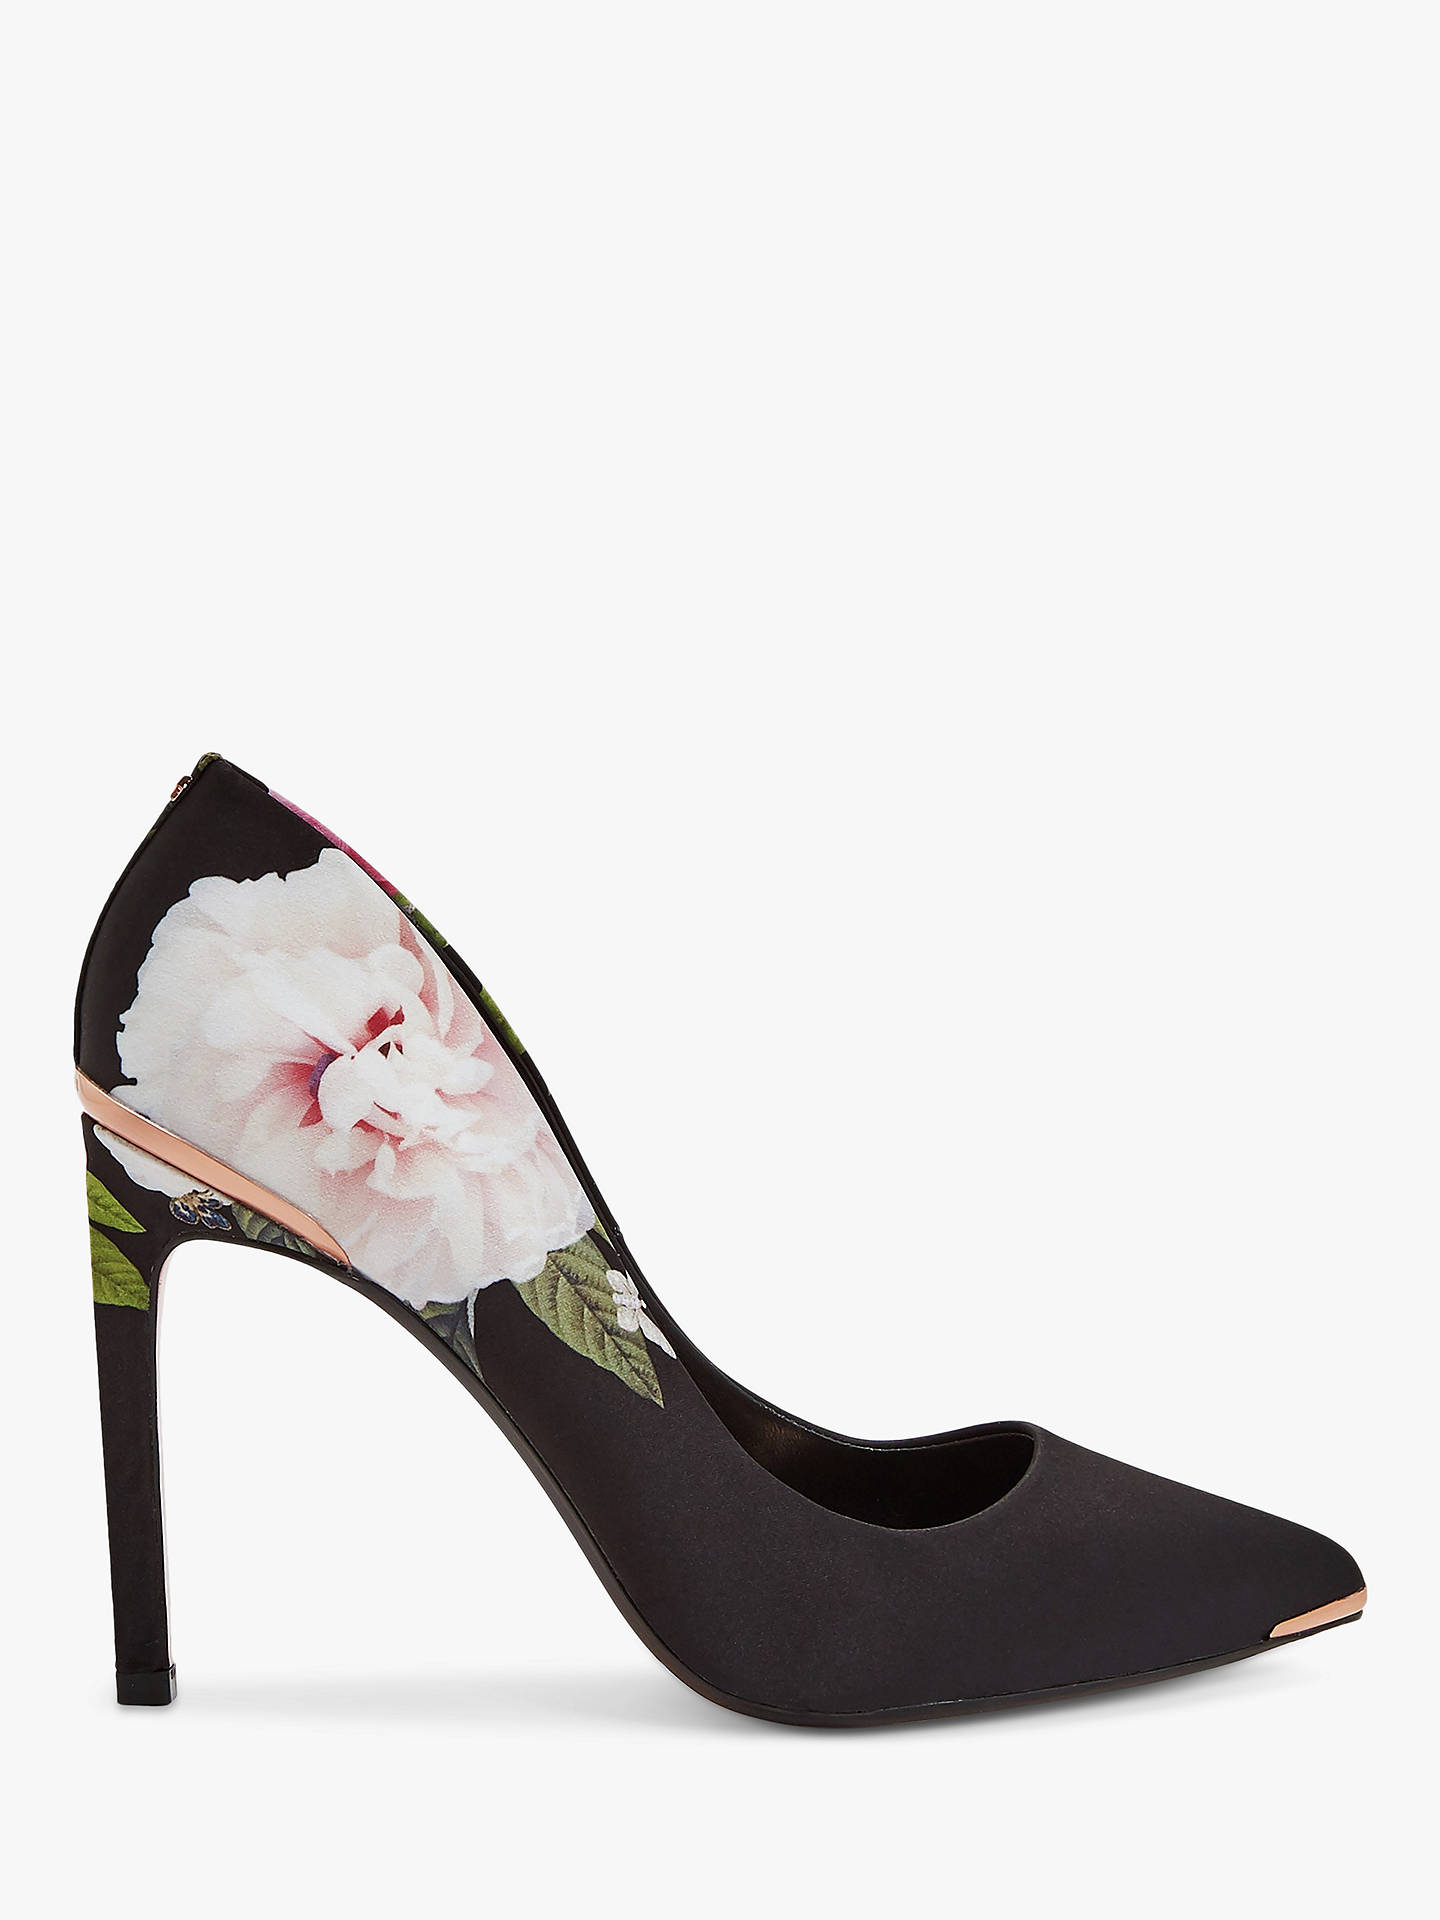 dc71b0f6fcf Ted Baker Melnip Floral Stiletto Heel Court Shoes, Black/Multi